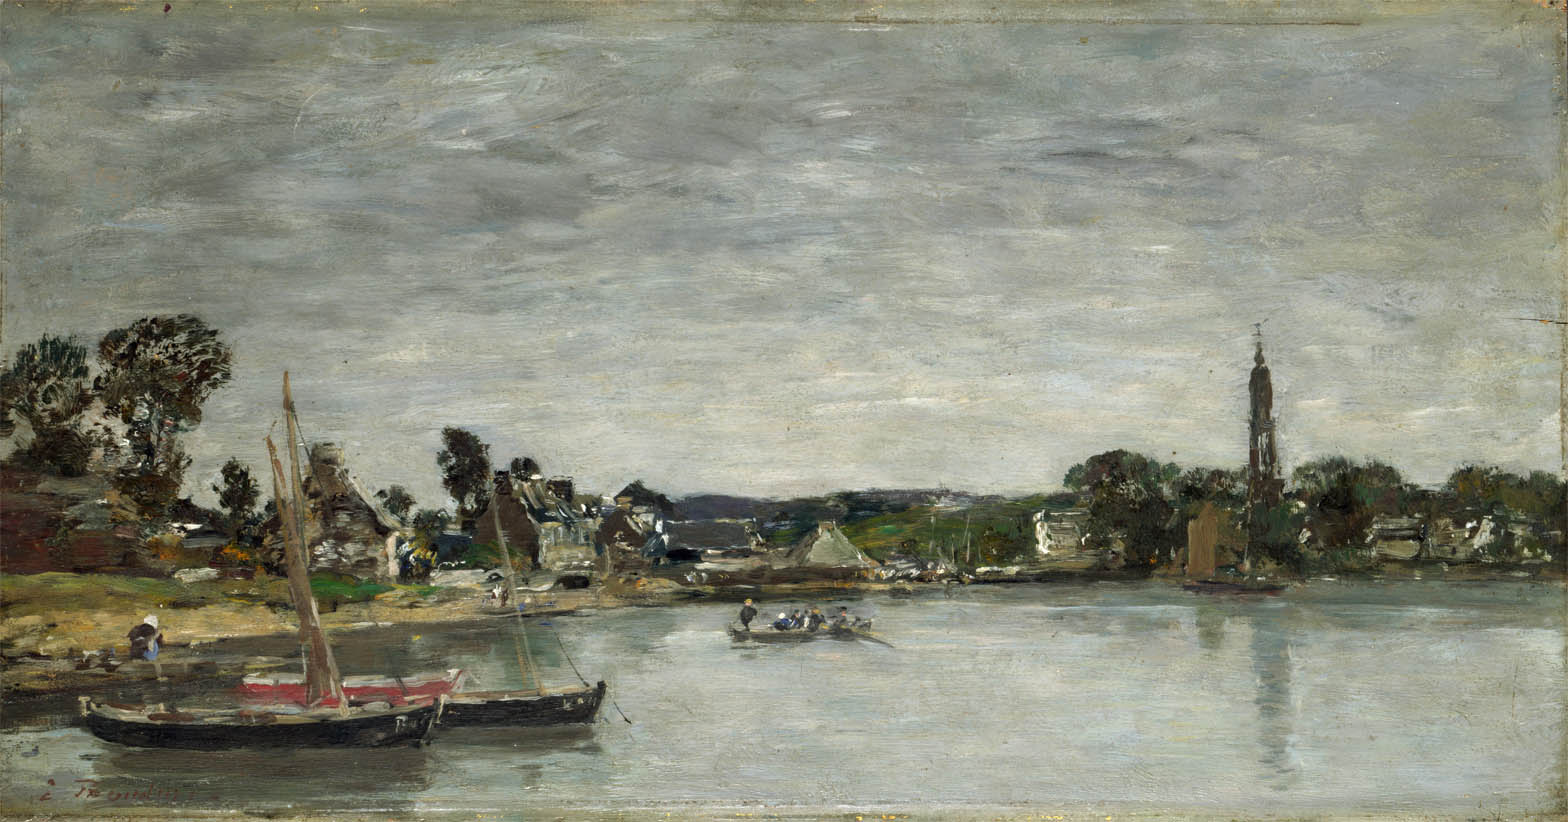 Hôpital-Camfrout, Bretagne (1870-1872)